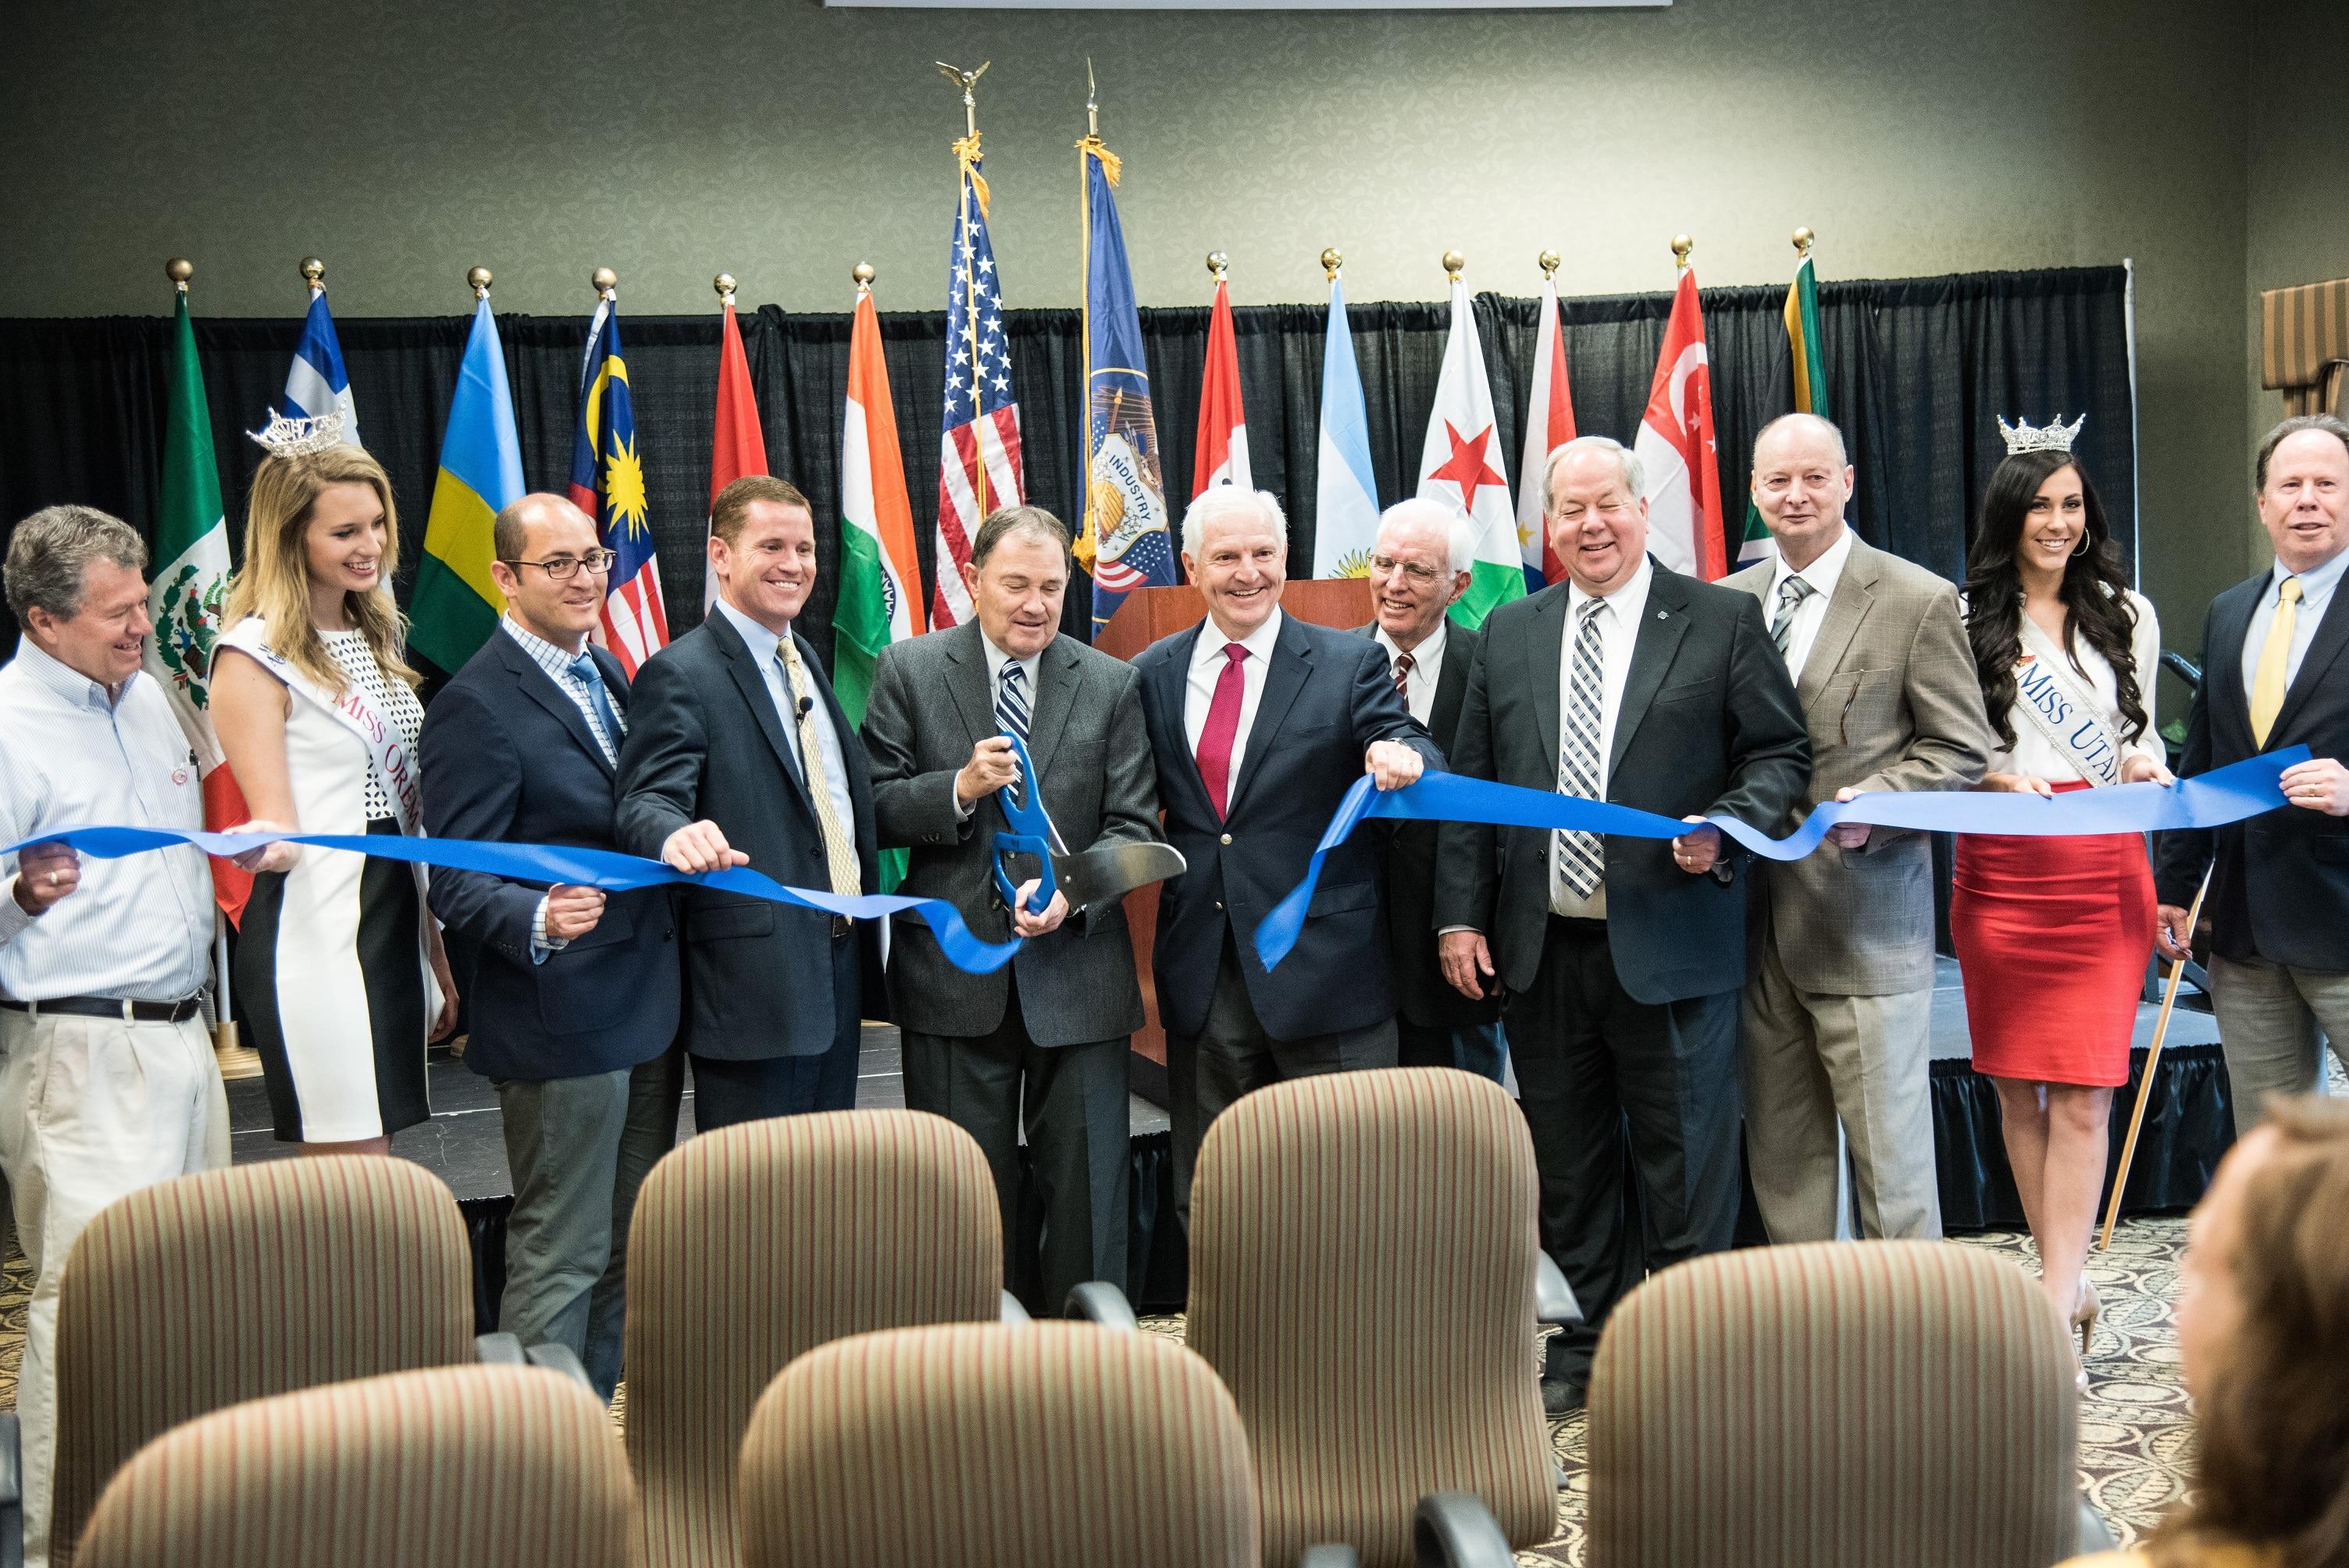 Governor Gary R. Herbert kicks off World Tour of Leadership